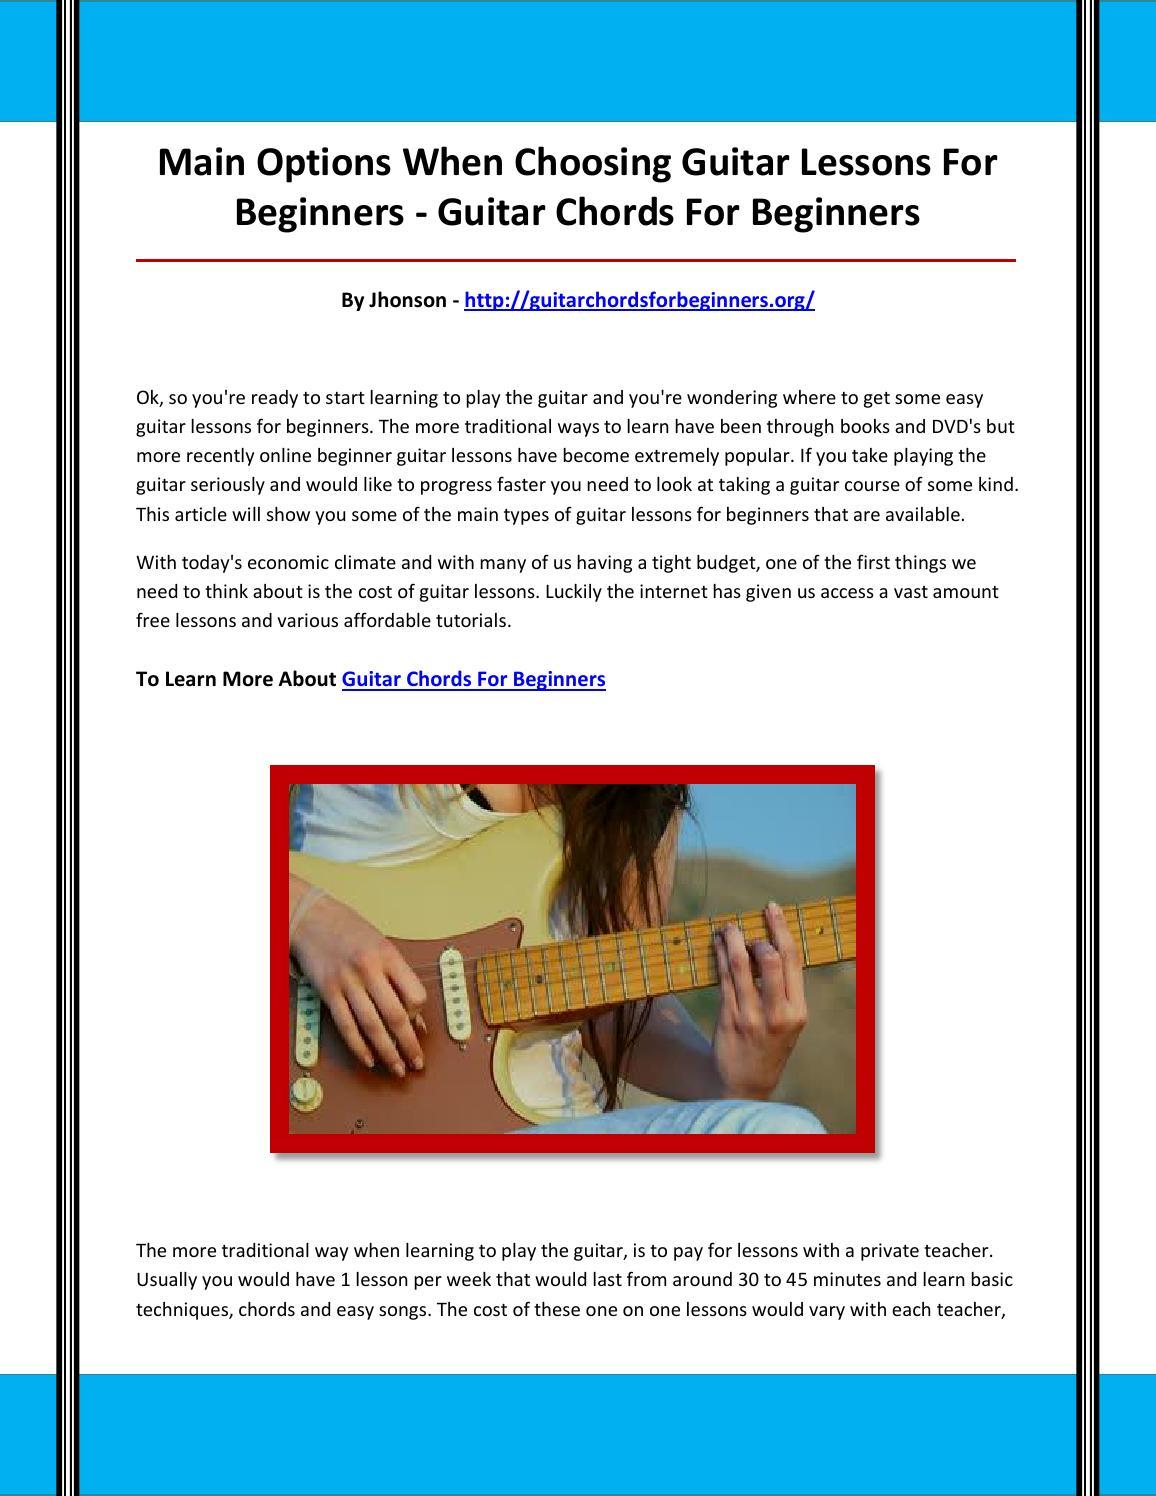 Guitar Chords For Beginners By Nbmnjghbnjghbyg Issuu